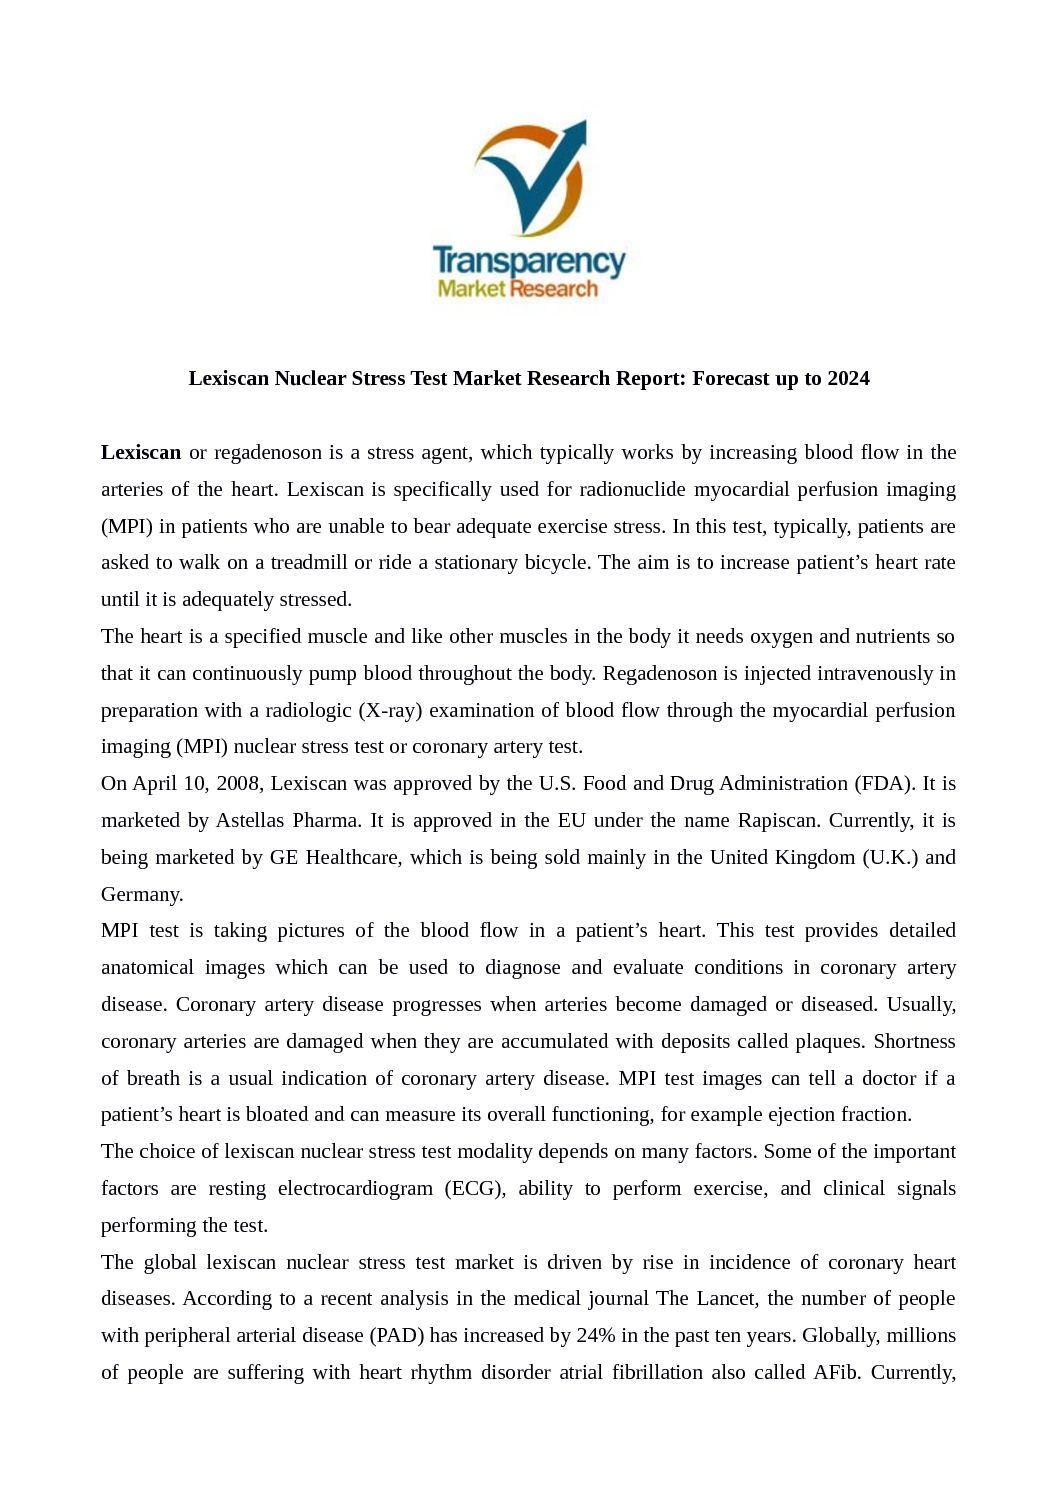 Calameo Lexiscan Nuclear Stress Test Market